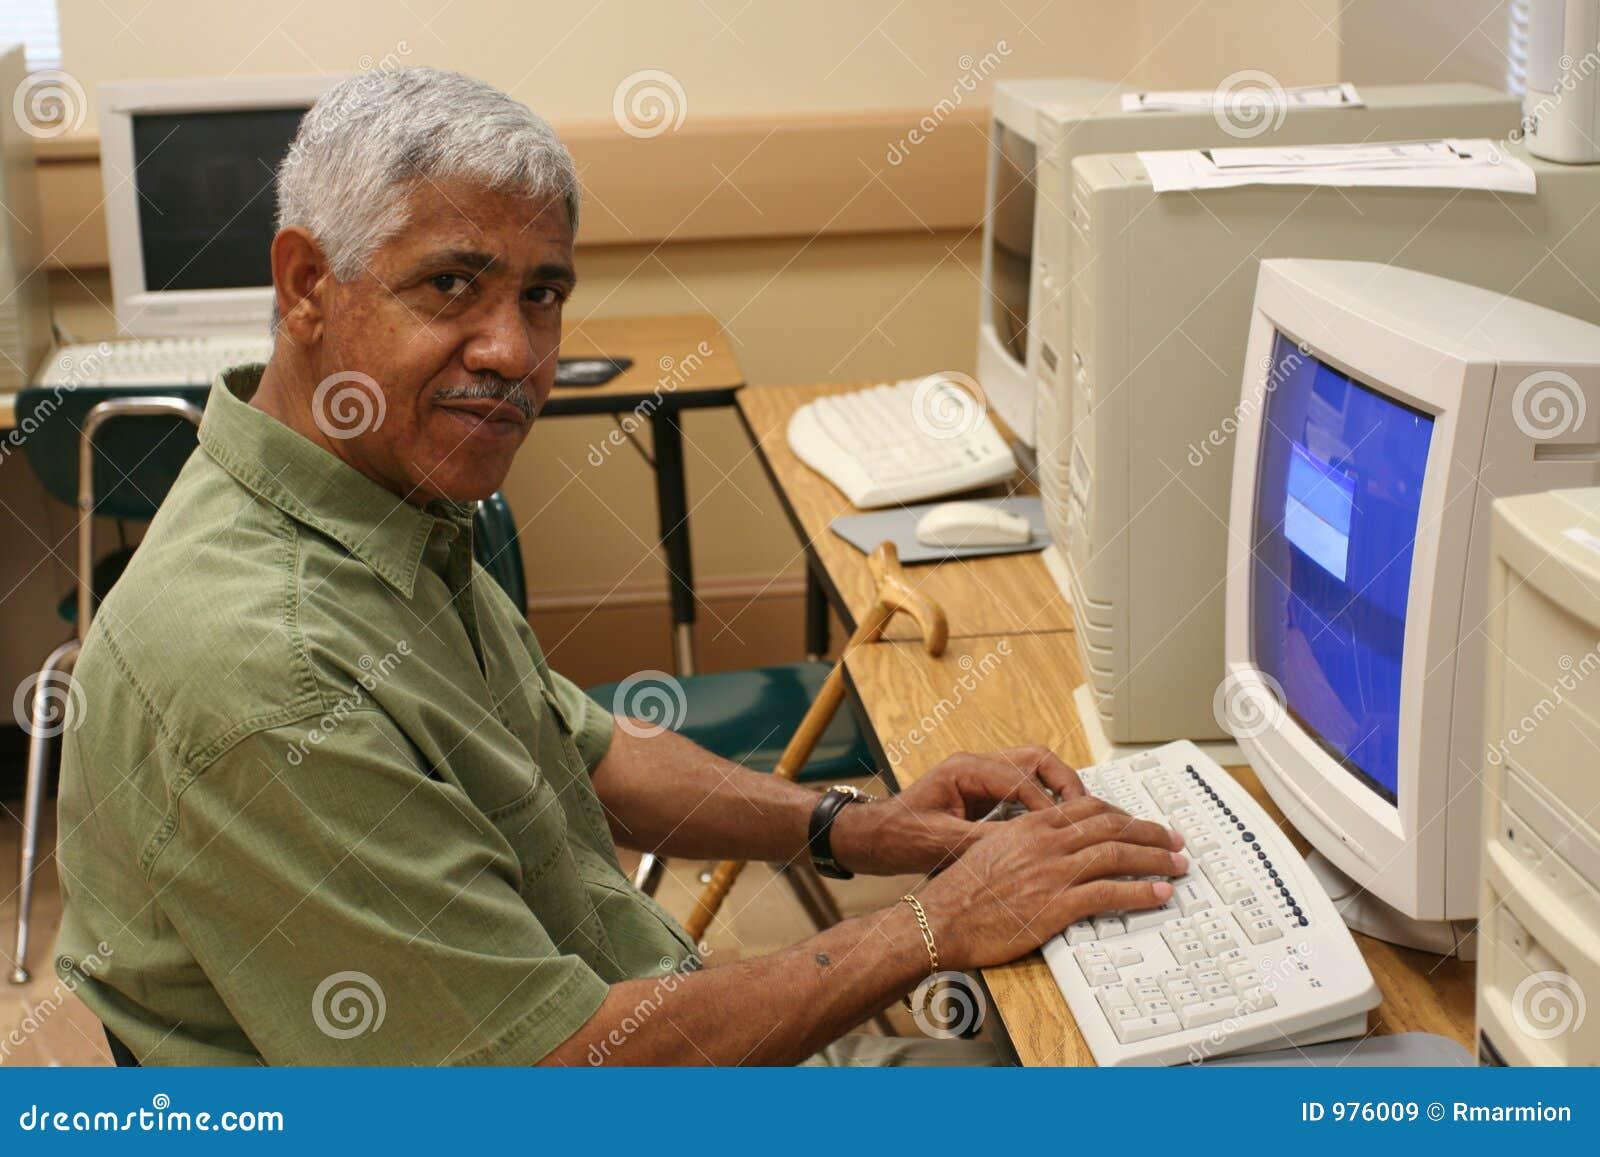 Senior Learning Computer